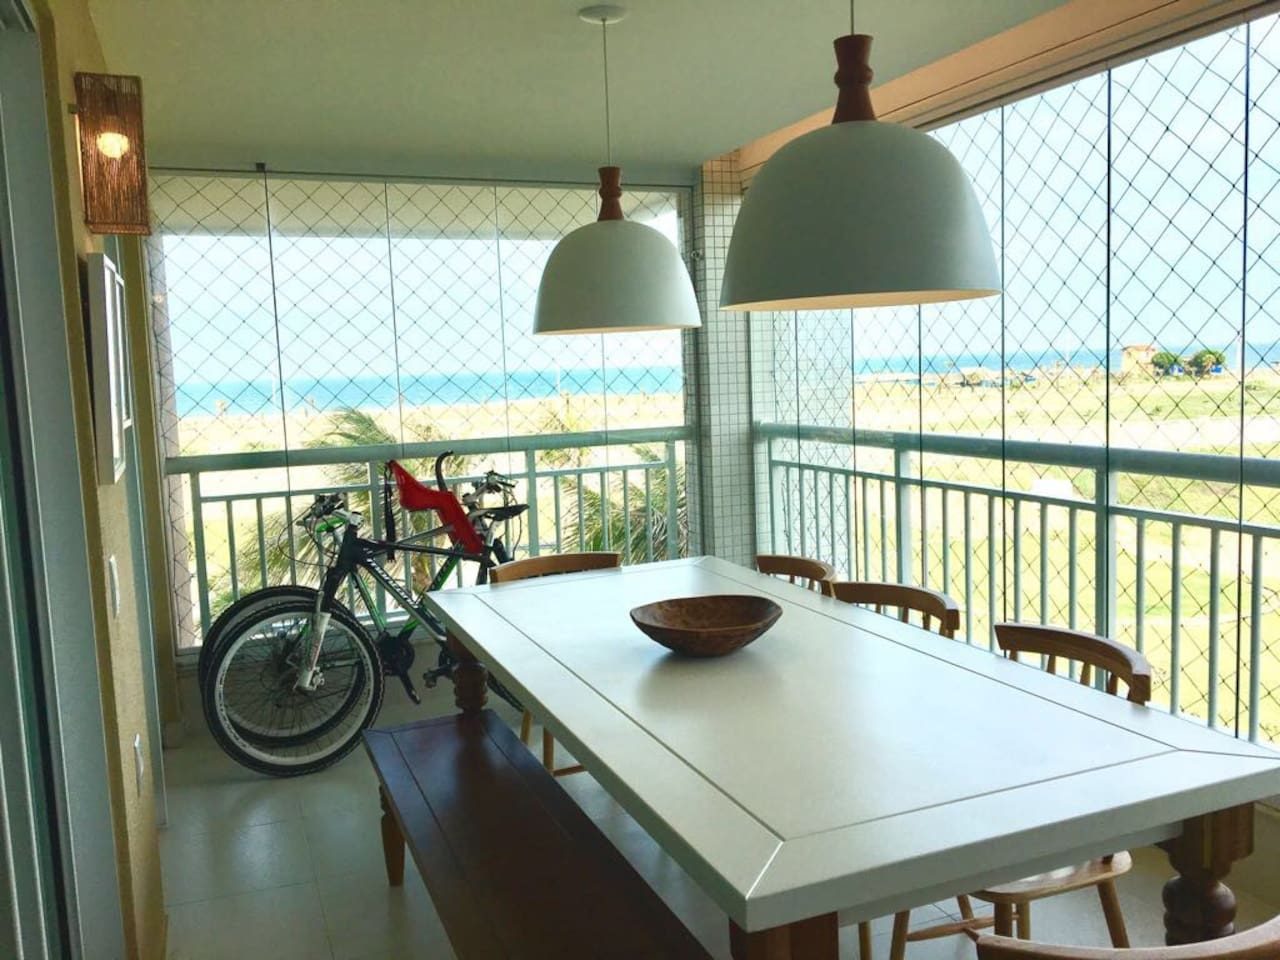 seaview at the balcony